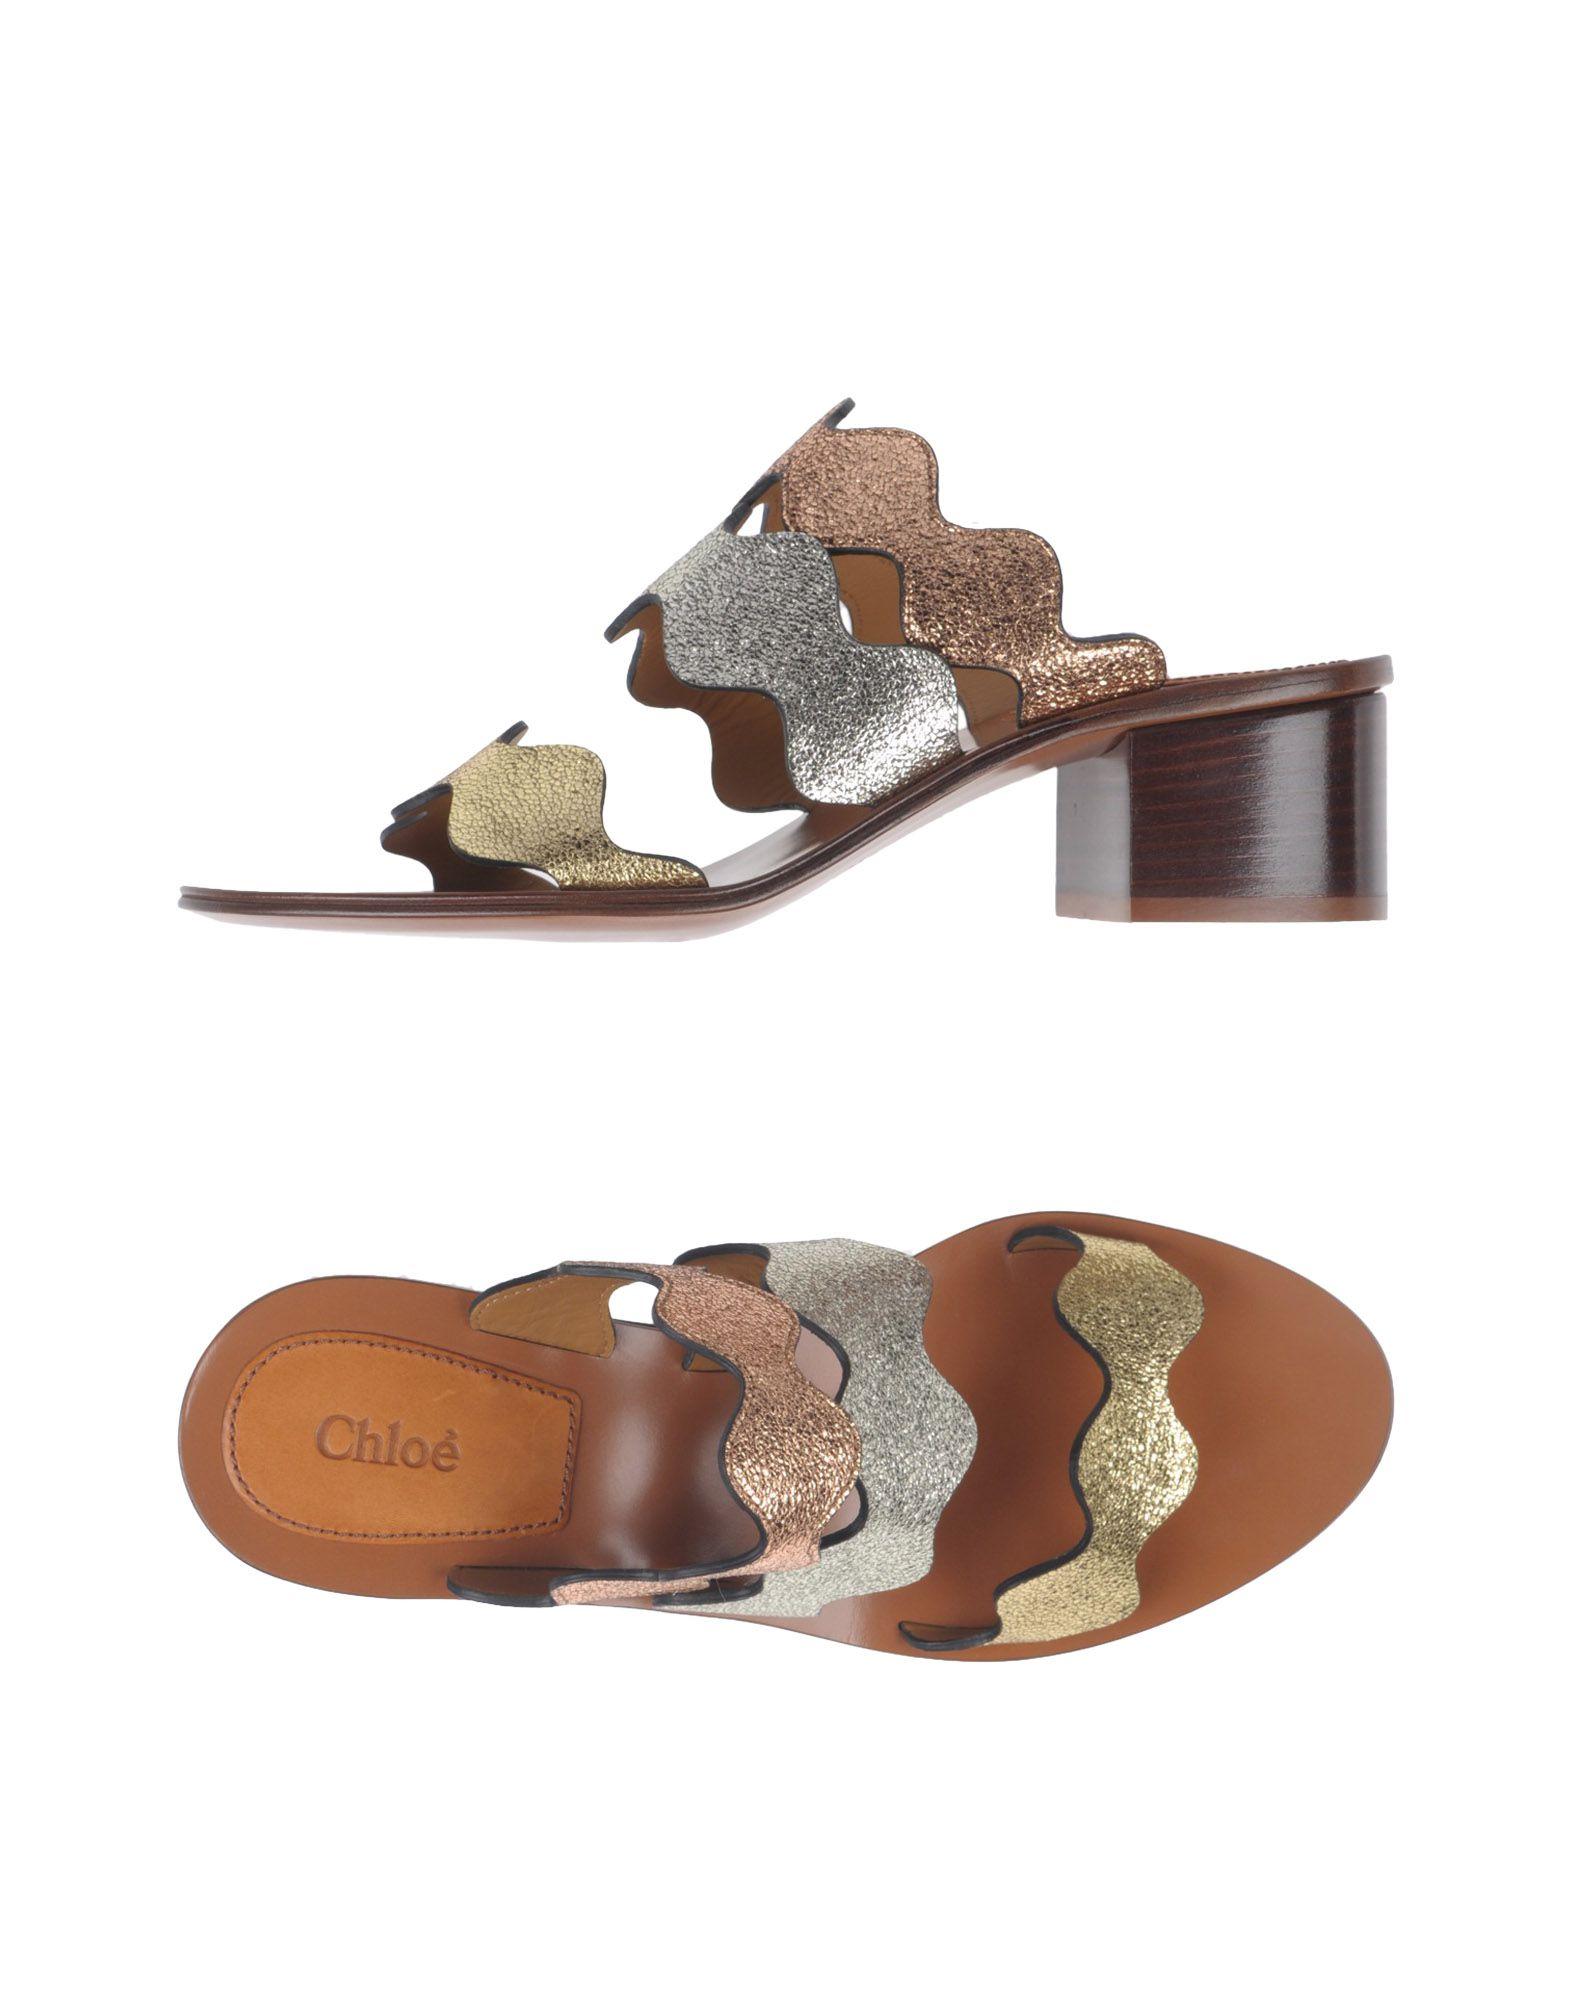 Moda Sandali Chloé Donna - 11393025QX